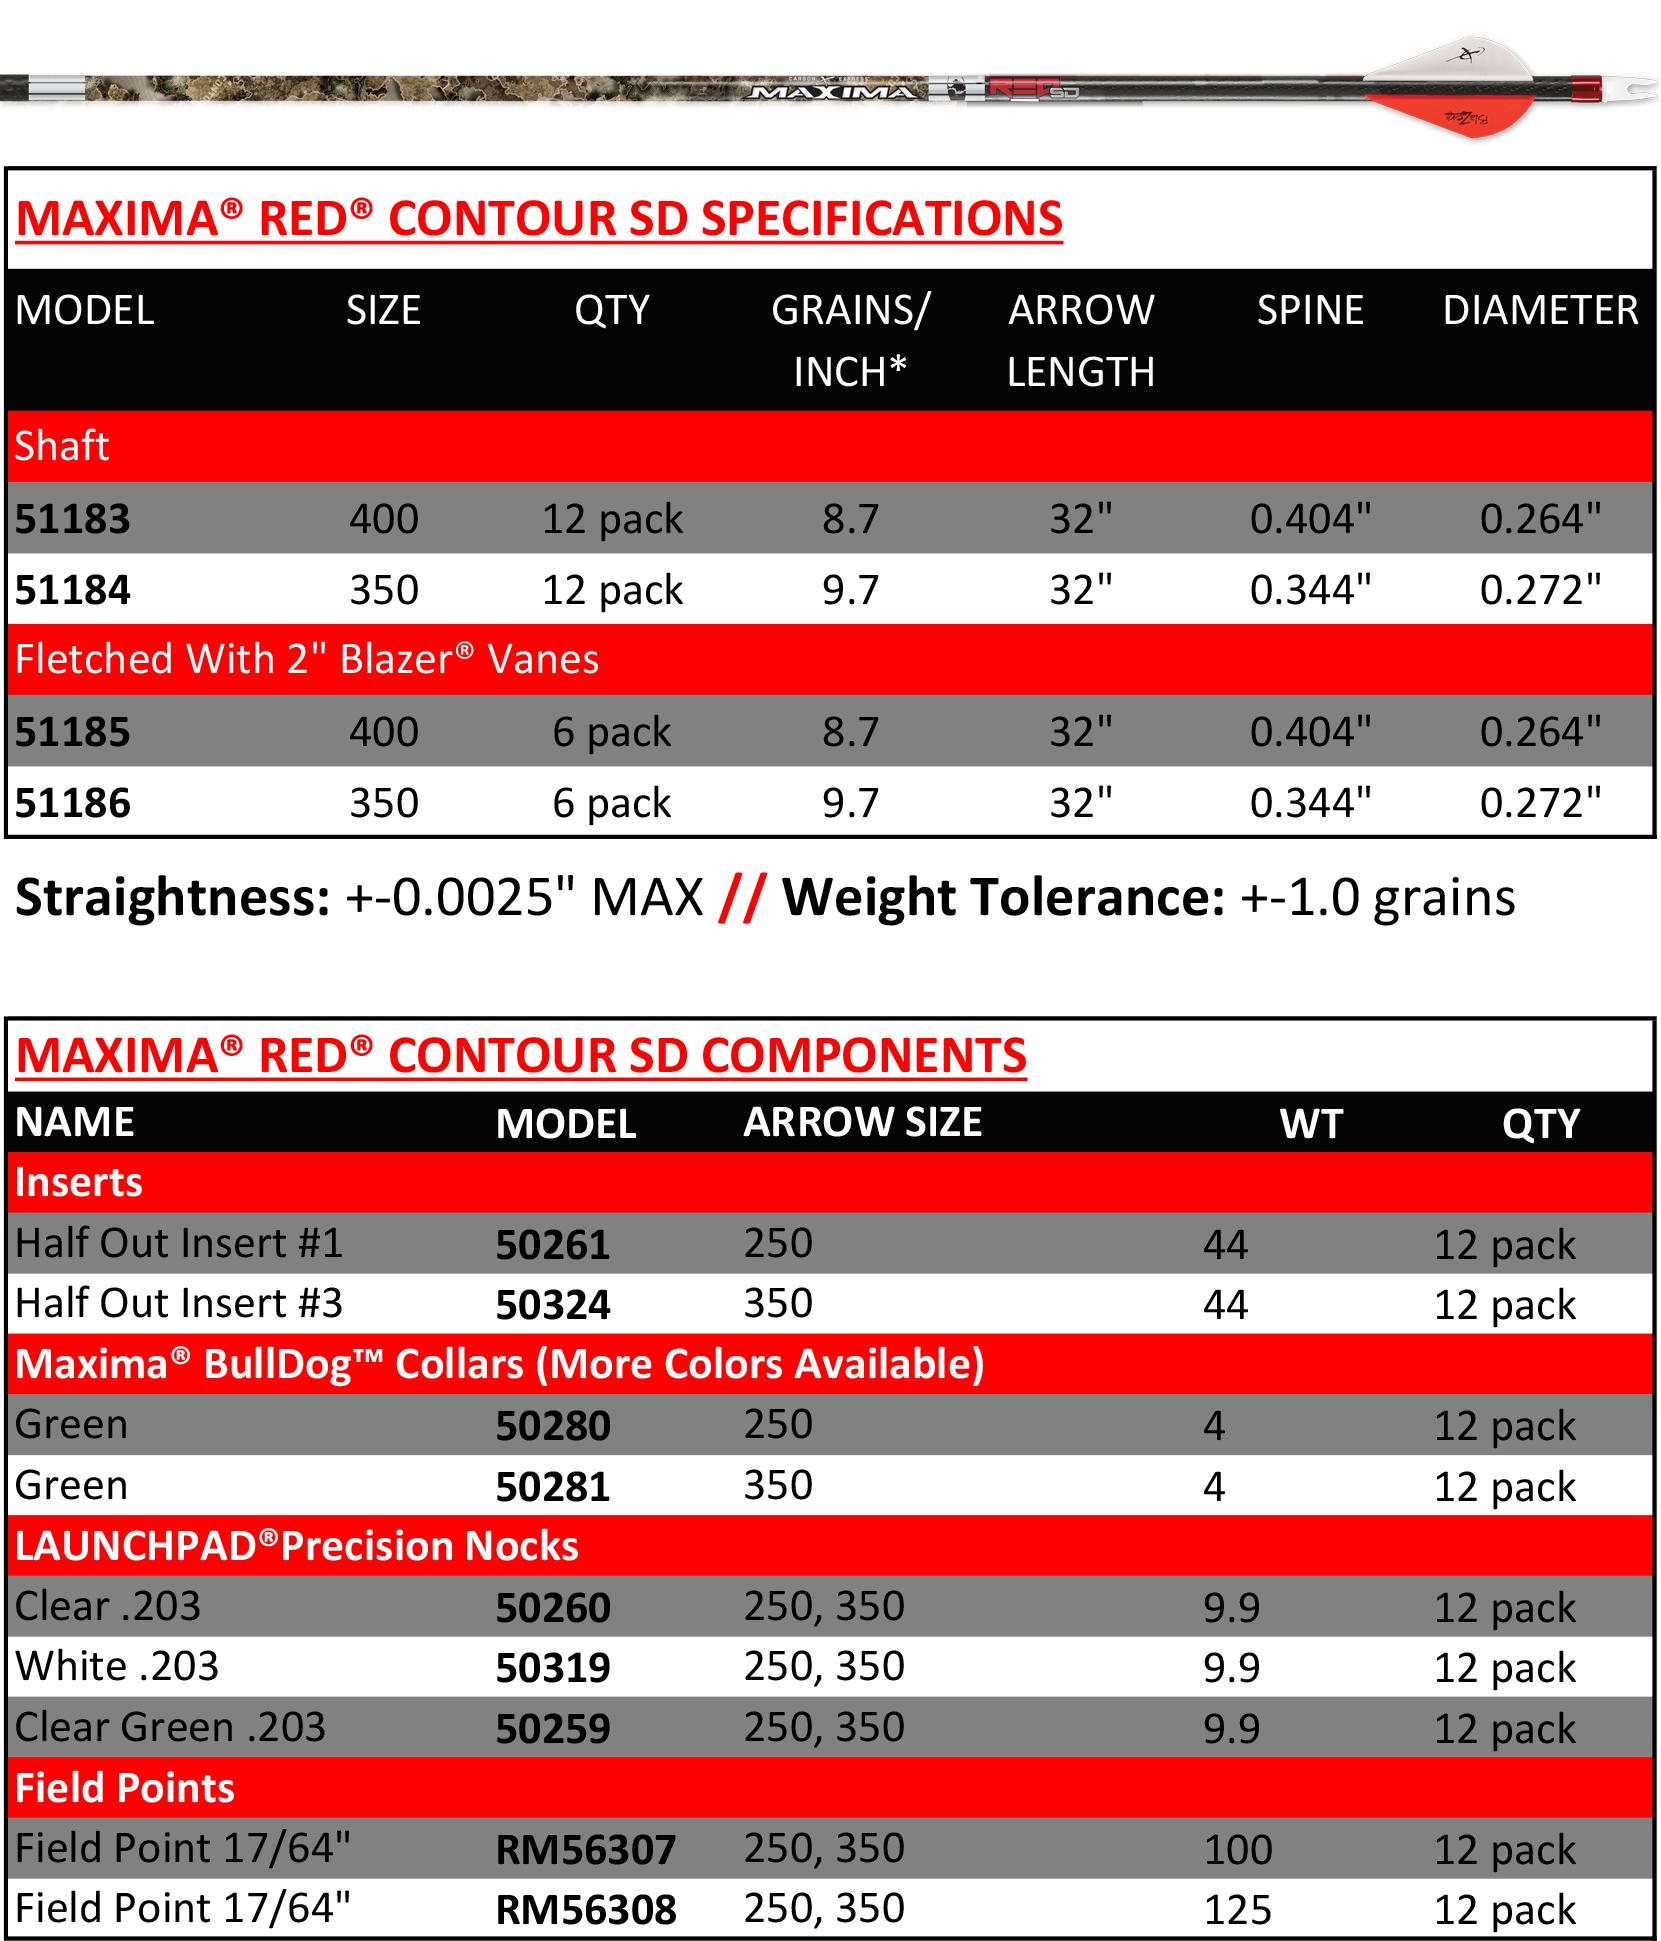 maxima red contour sd charts